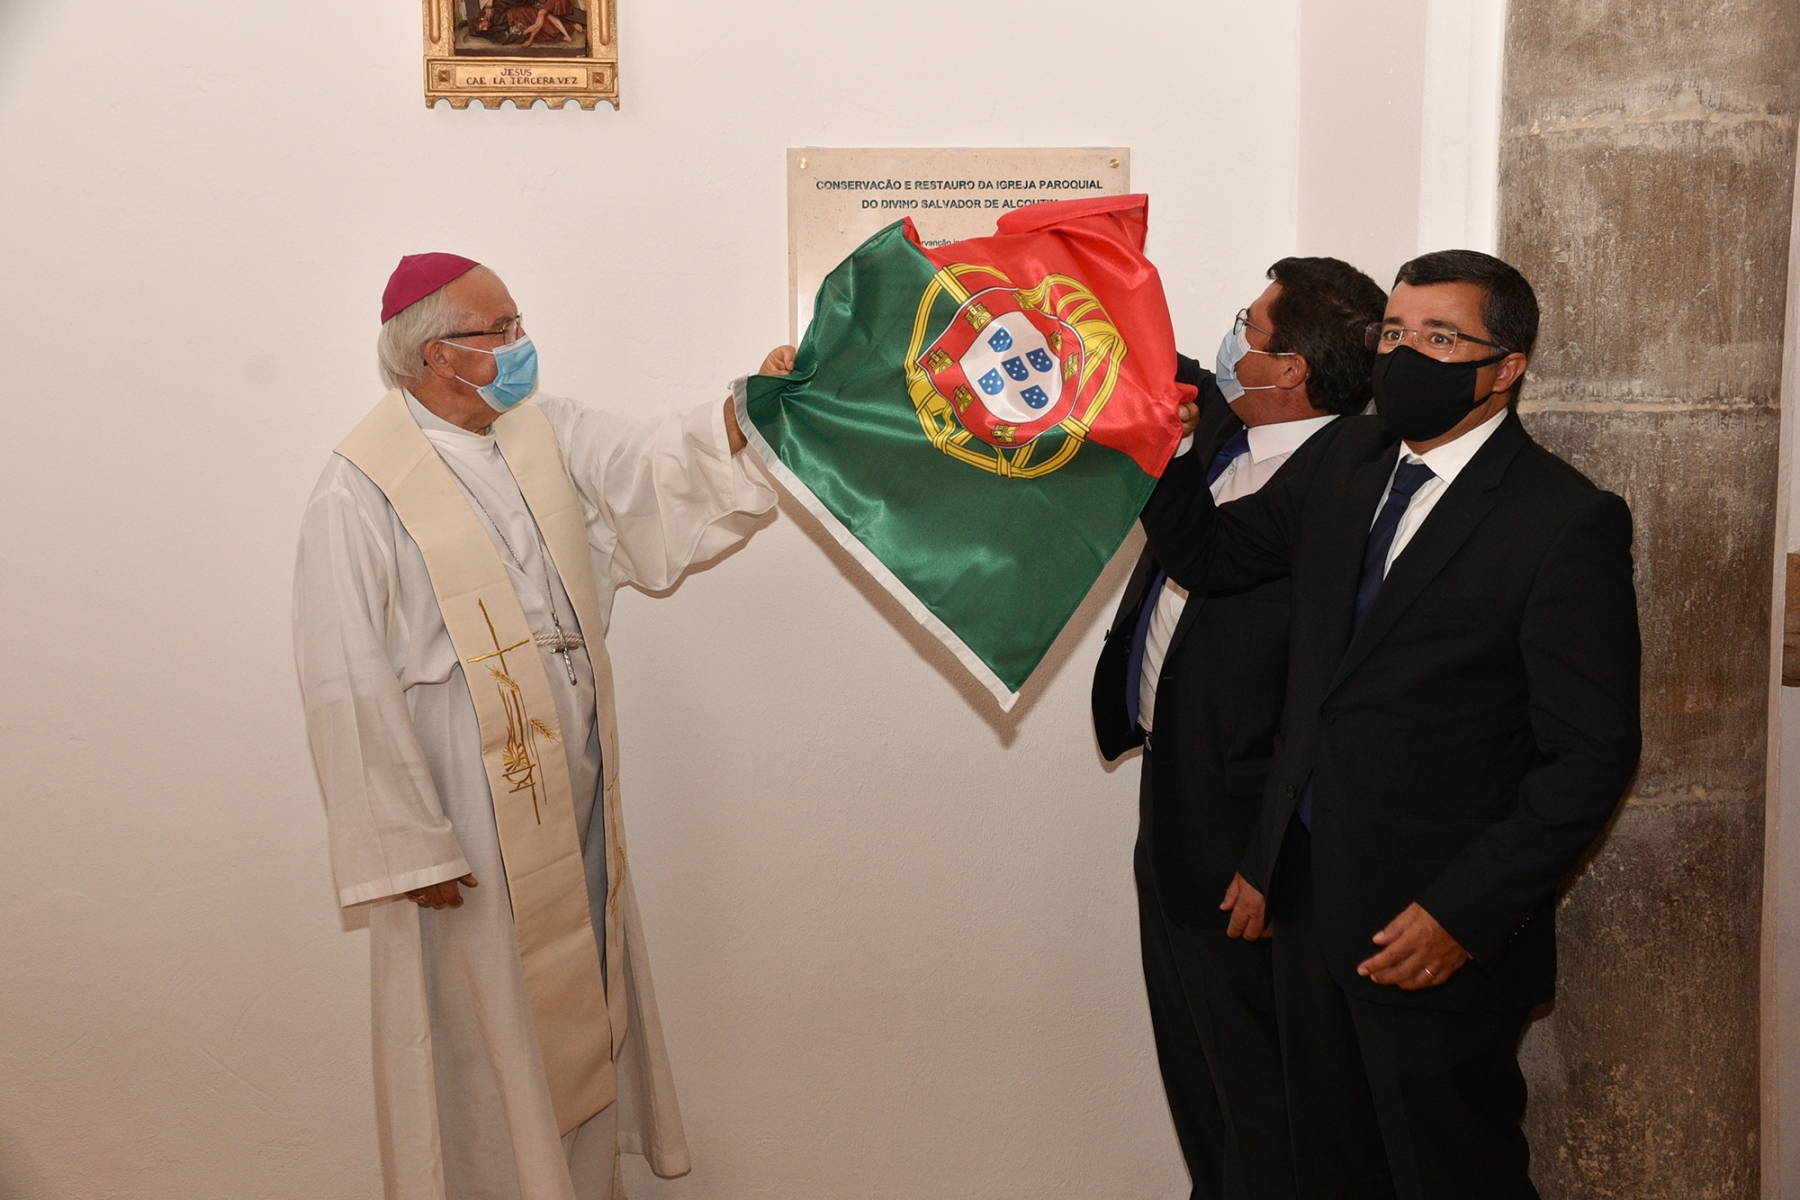 Inauguracao_bencao_obras_restauro_igreja_alcoutim-36